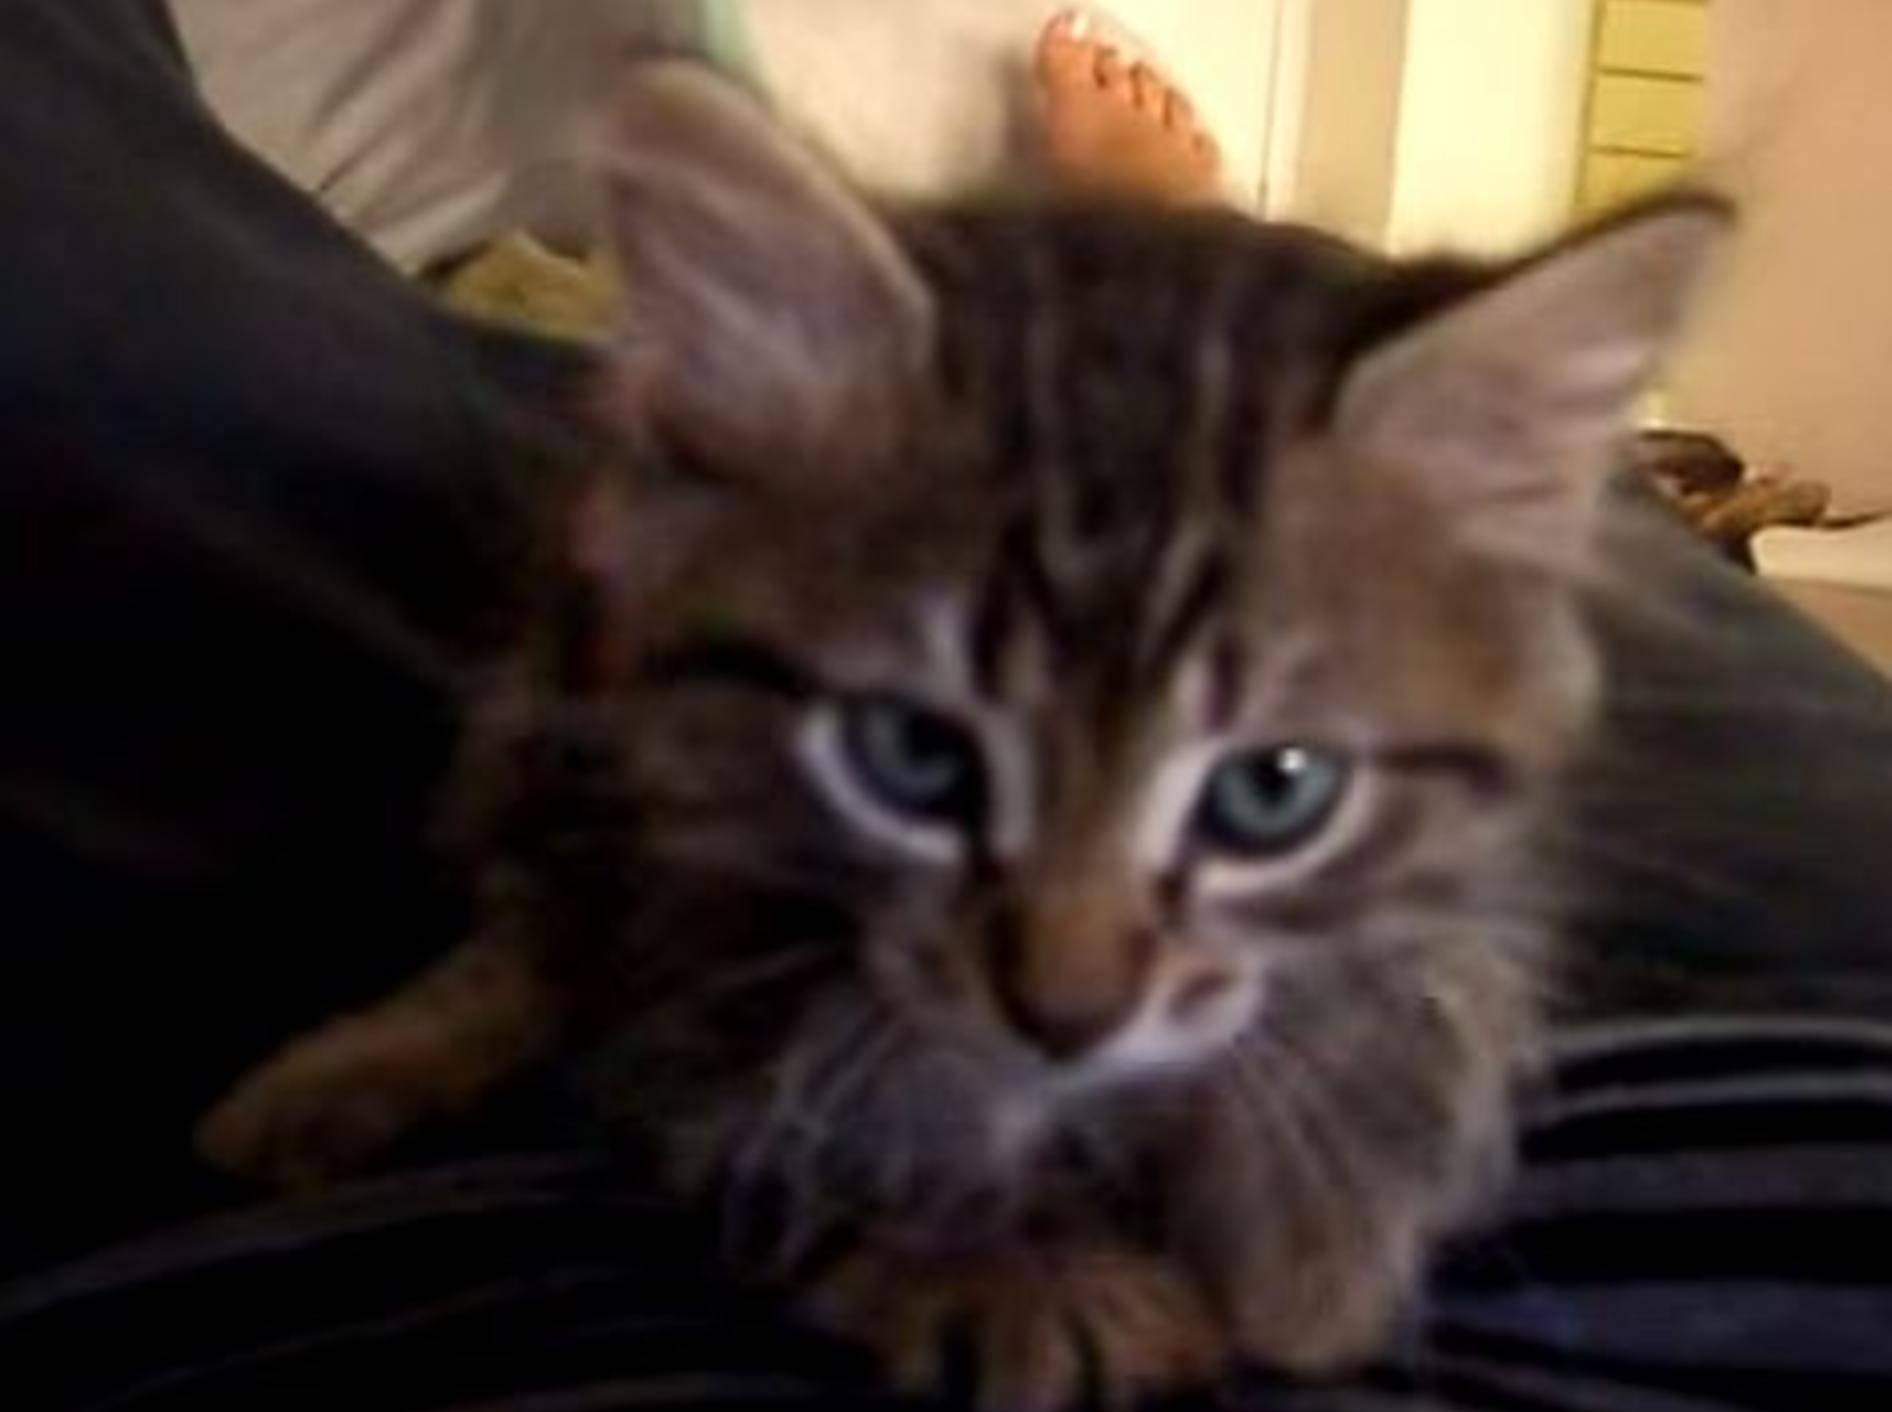 Supersüß: Eine Mini-Maine-Coon miaut – Bild: Youtube / rip211